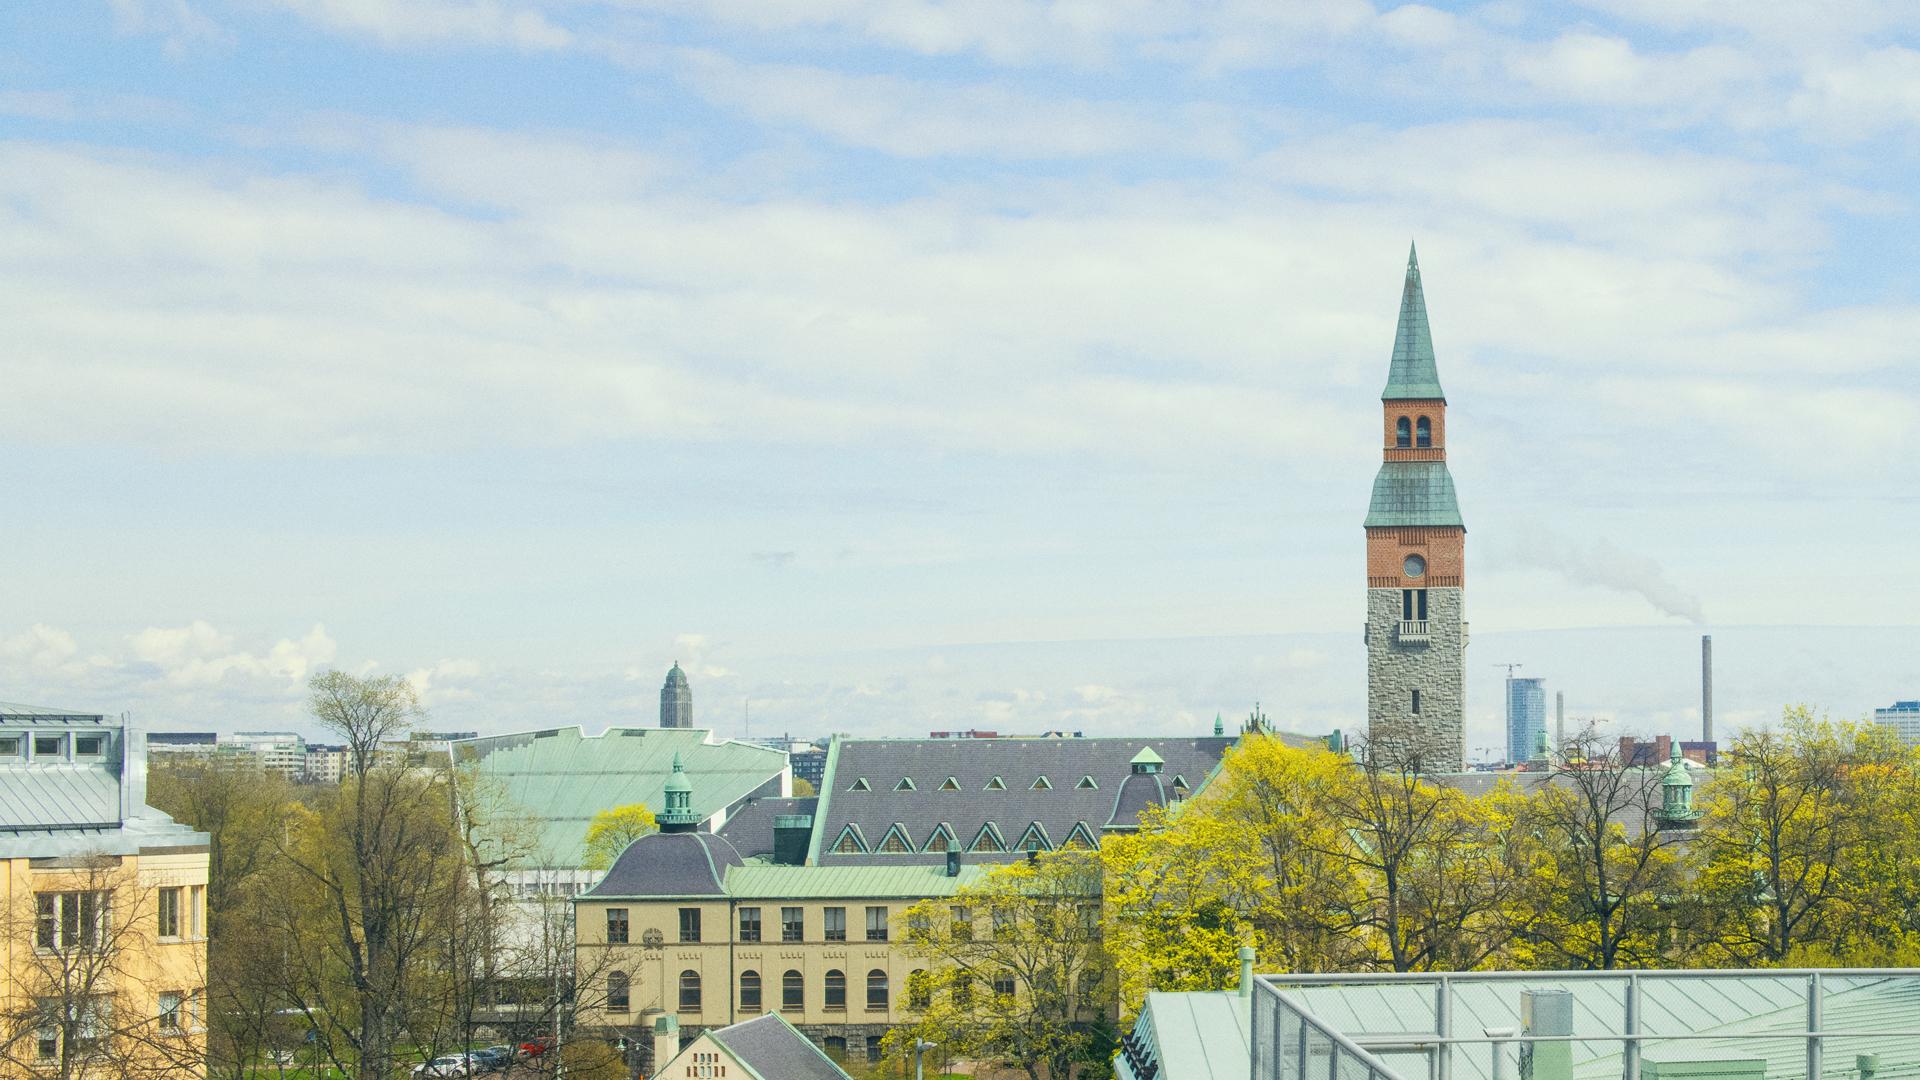 Helsingin kaupunkikuvaa